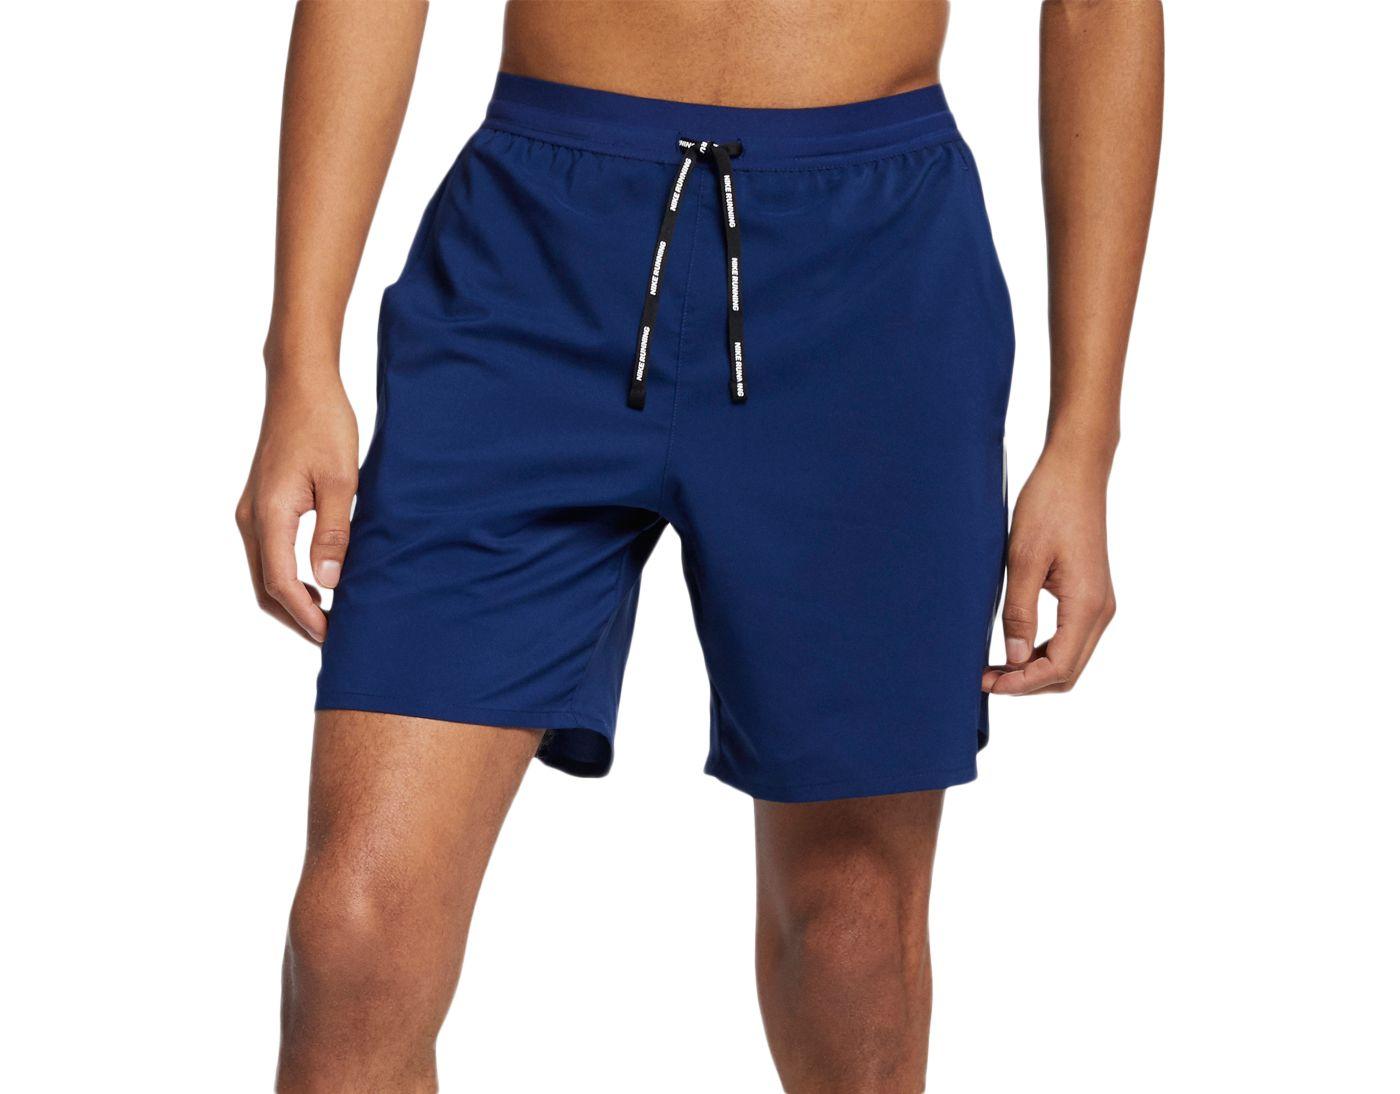 Nike Men's Flex Stride 2-in-1 Running Shorts